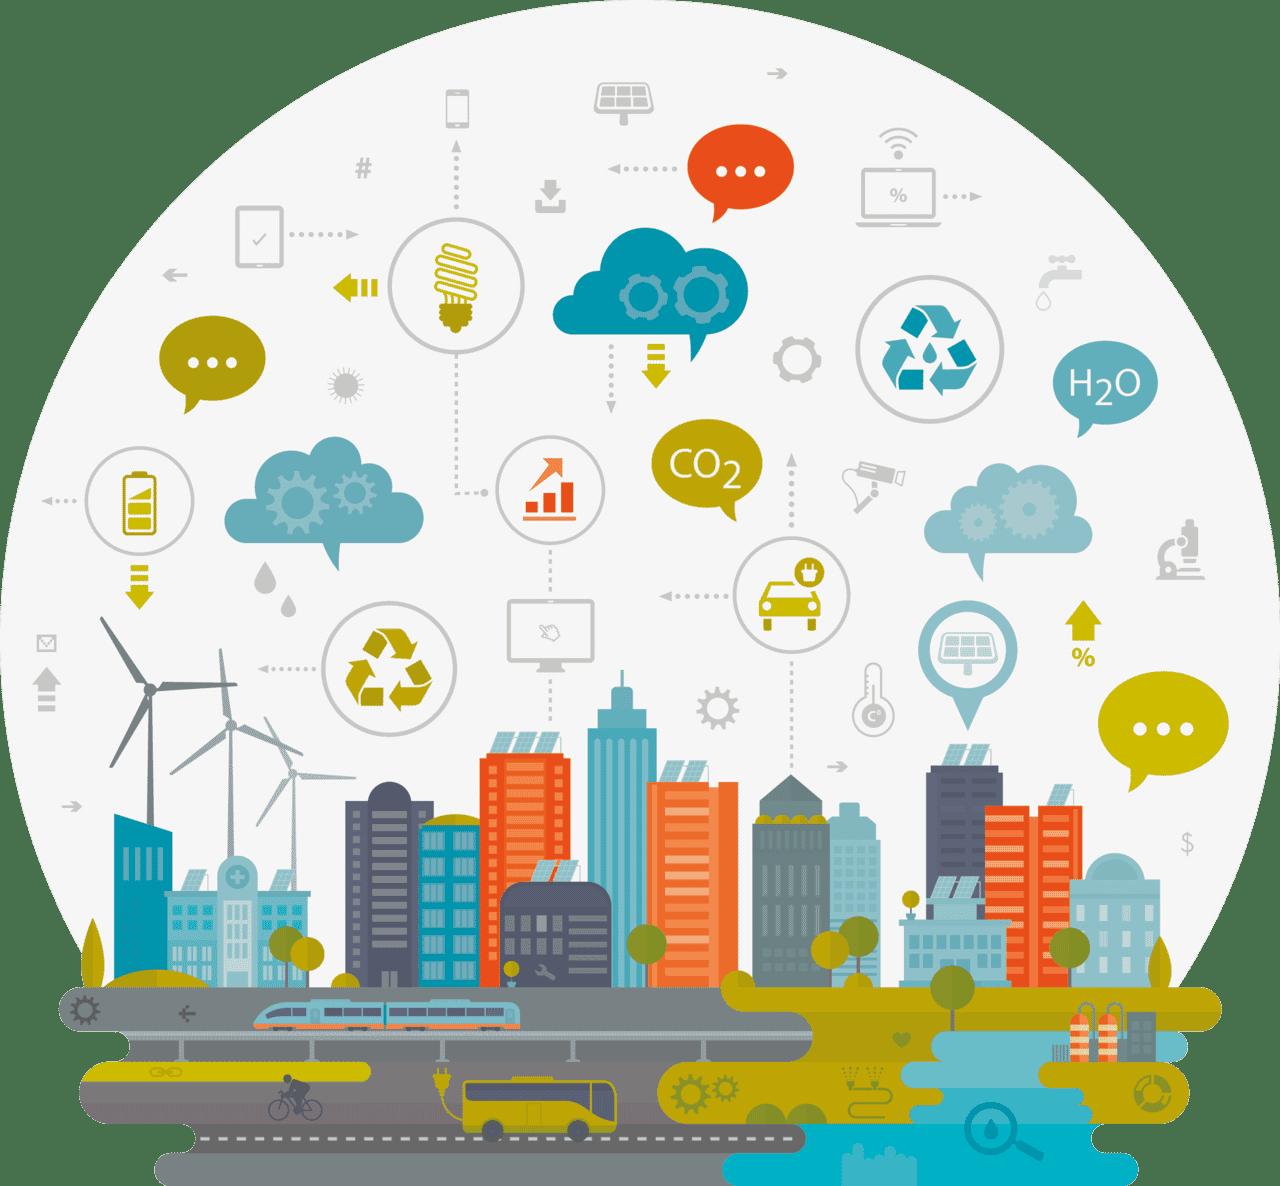 Eco-friendly-article-iStock-537350756